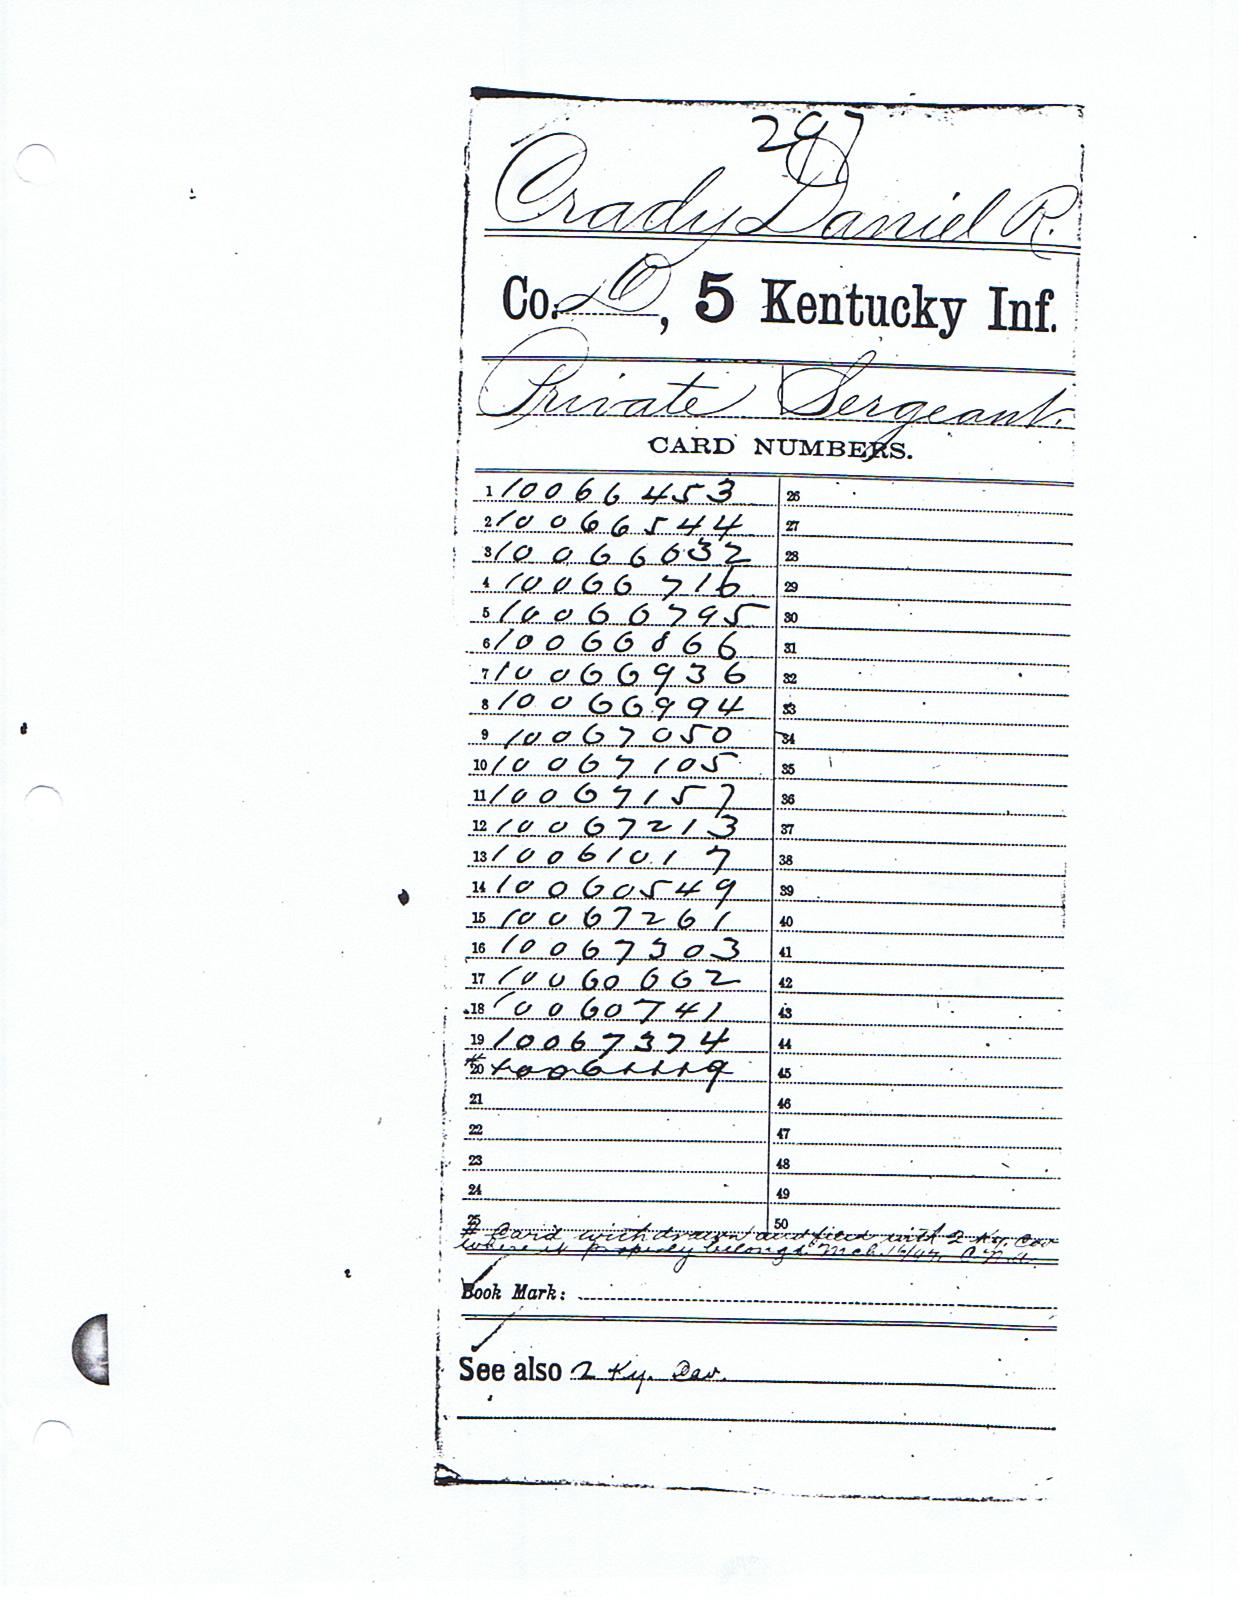 crady-kaufman_civil_war_records-3556